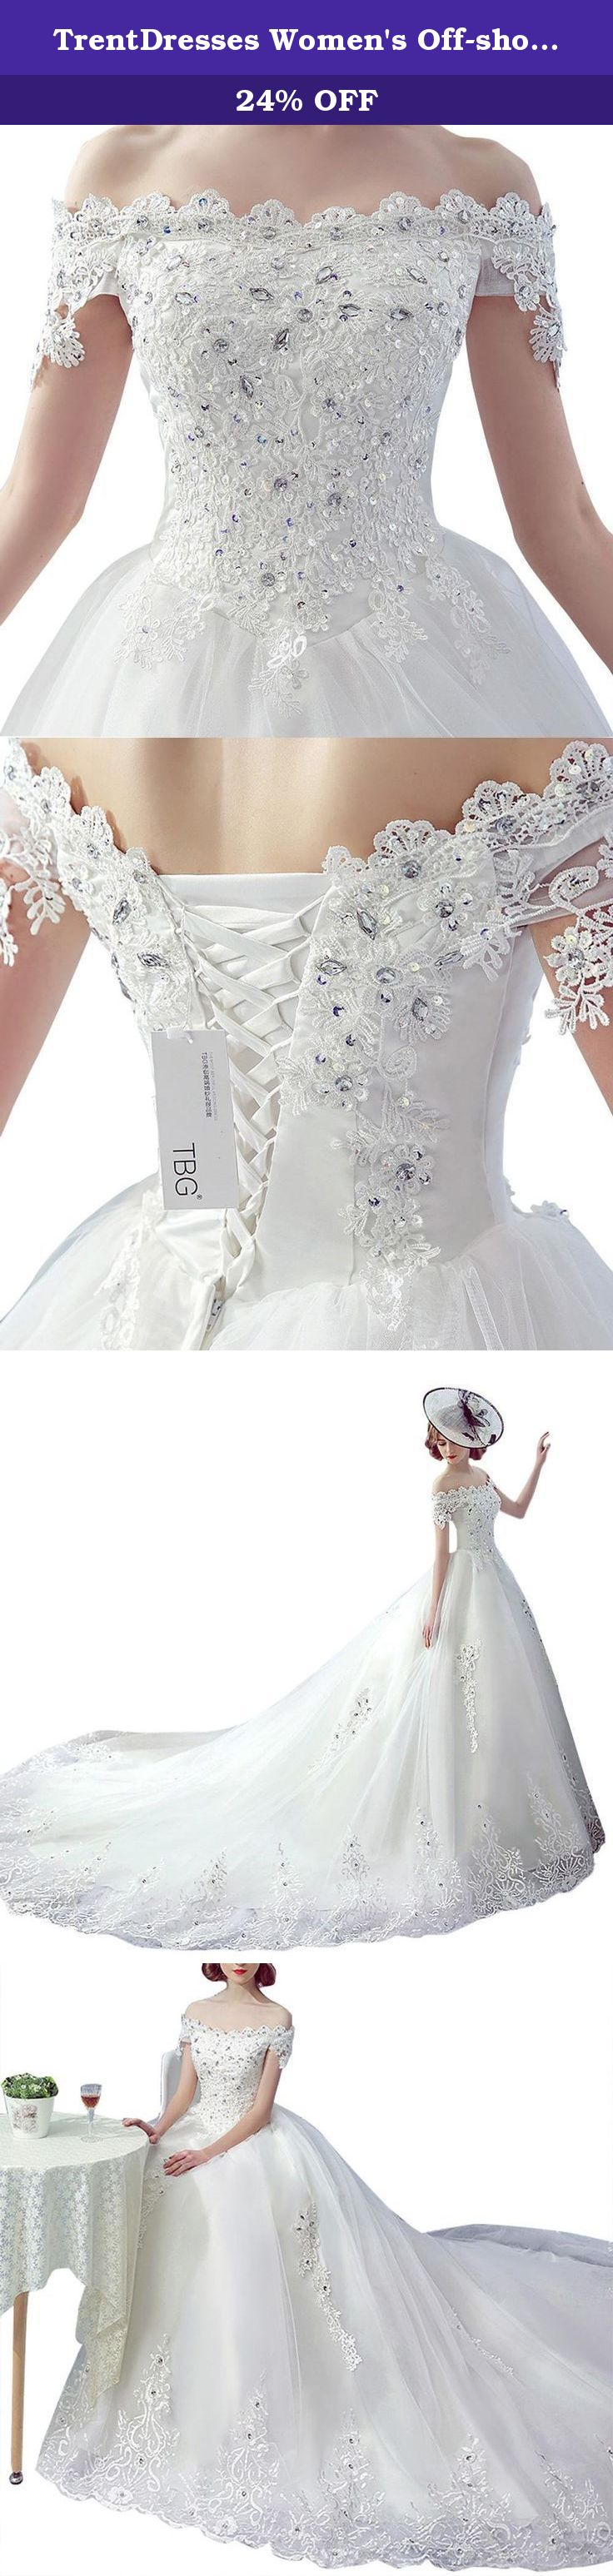 TrentDresses Womens Strapless Applique Wedding Dress